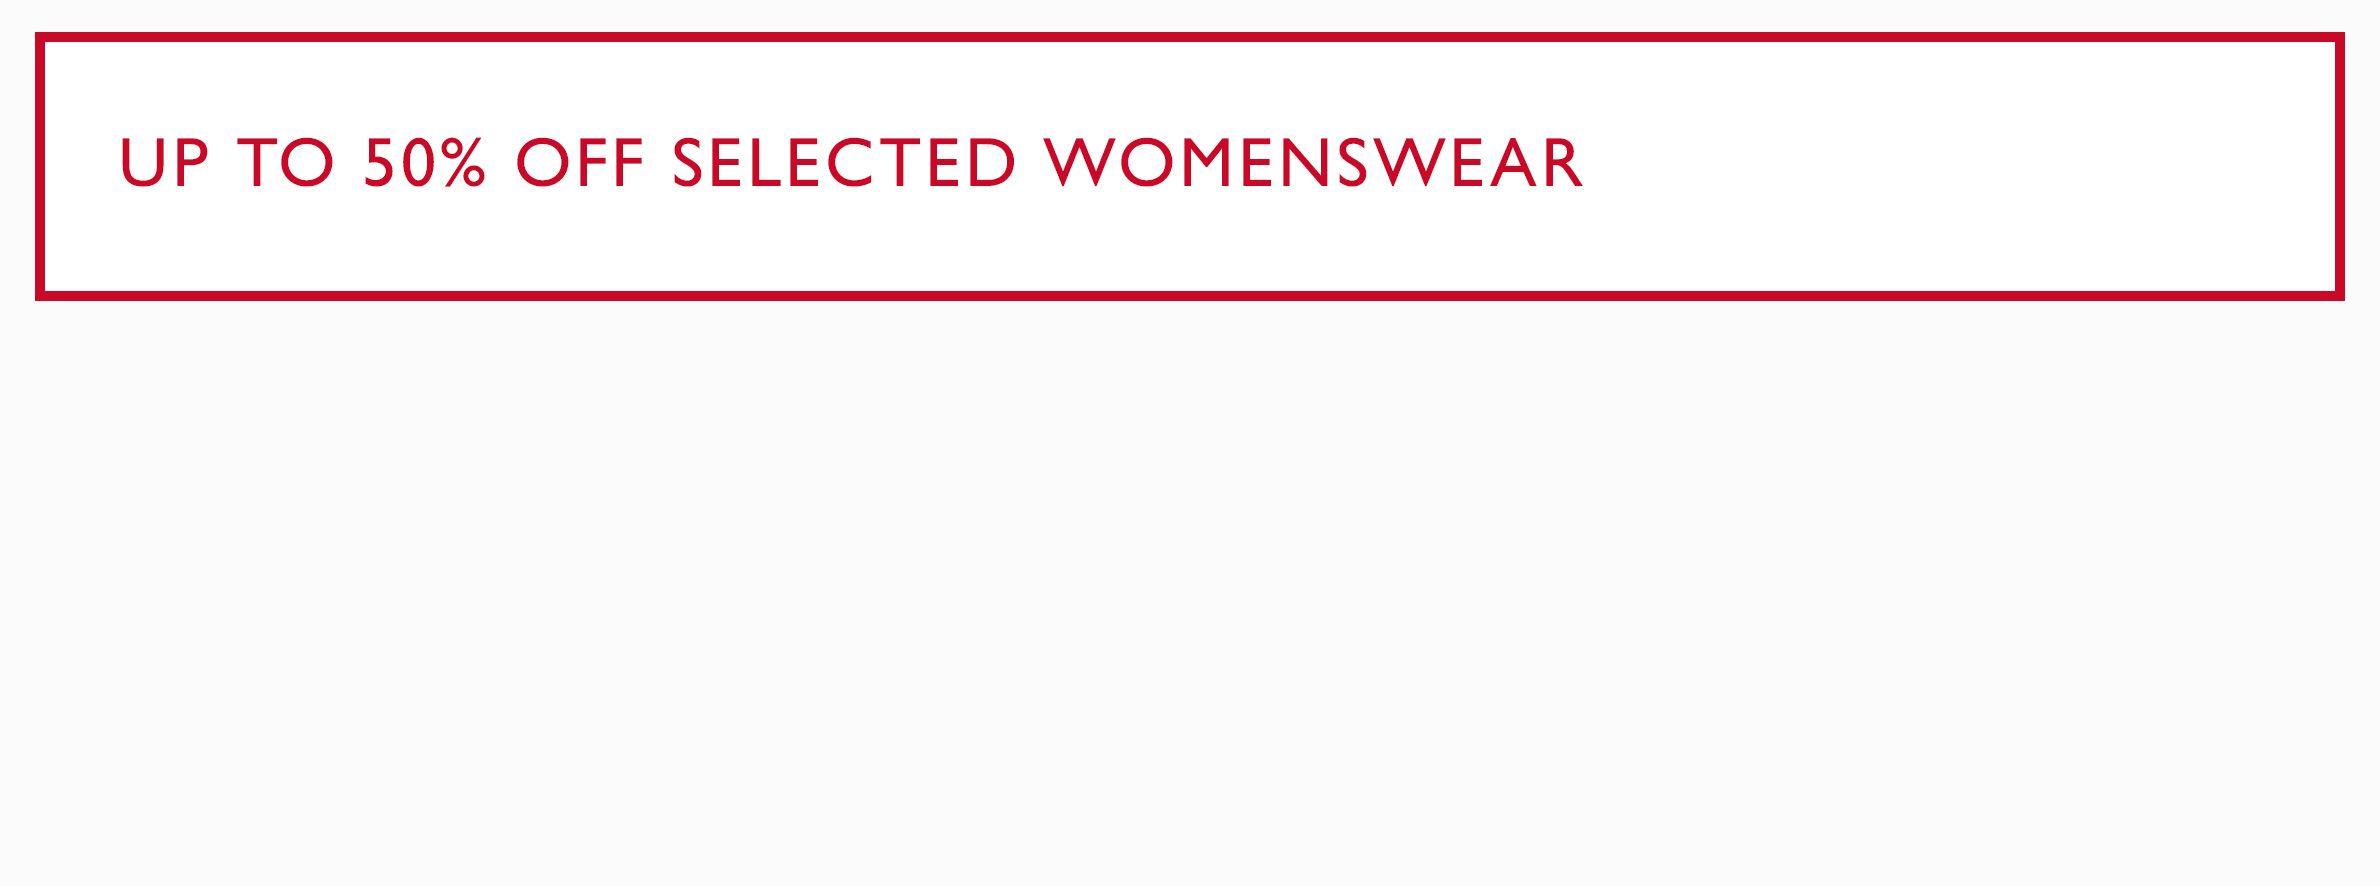 Womens Tops Shirts Blouses T Tunics John Lewis Extra Big Size Mysty Black Zip Hoodie Blouse Fit 6l Shop Now